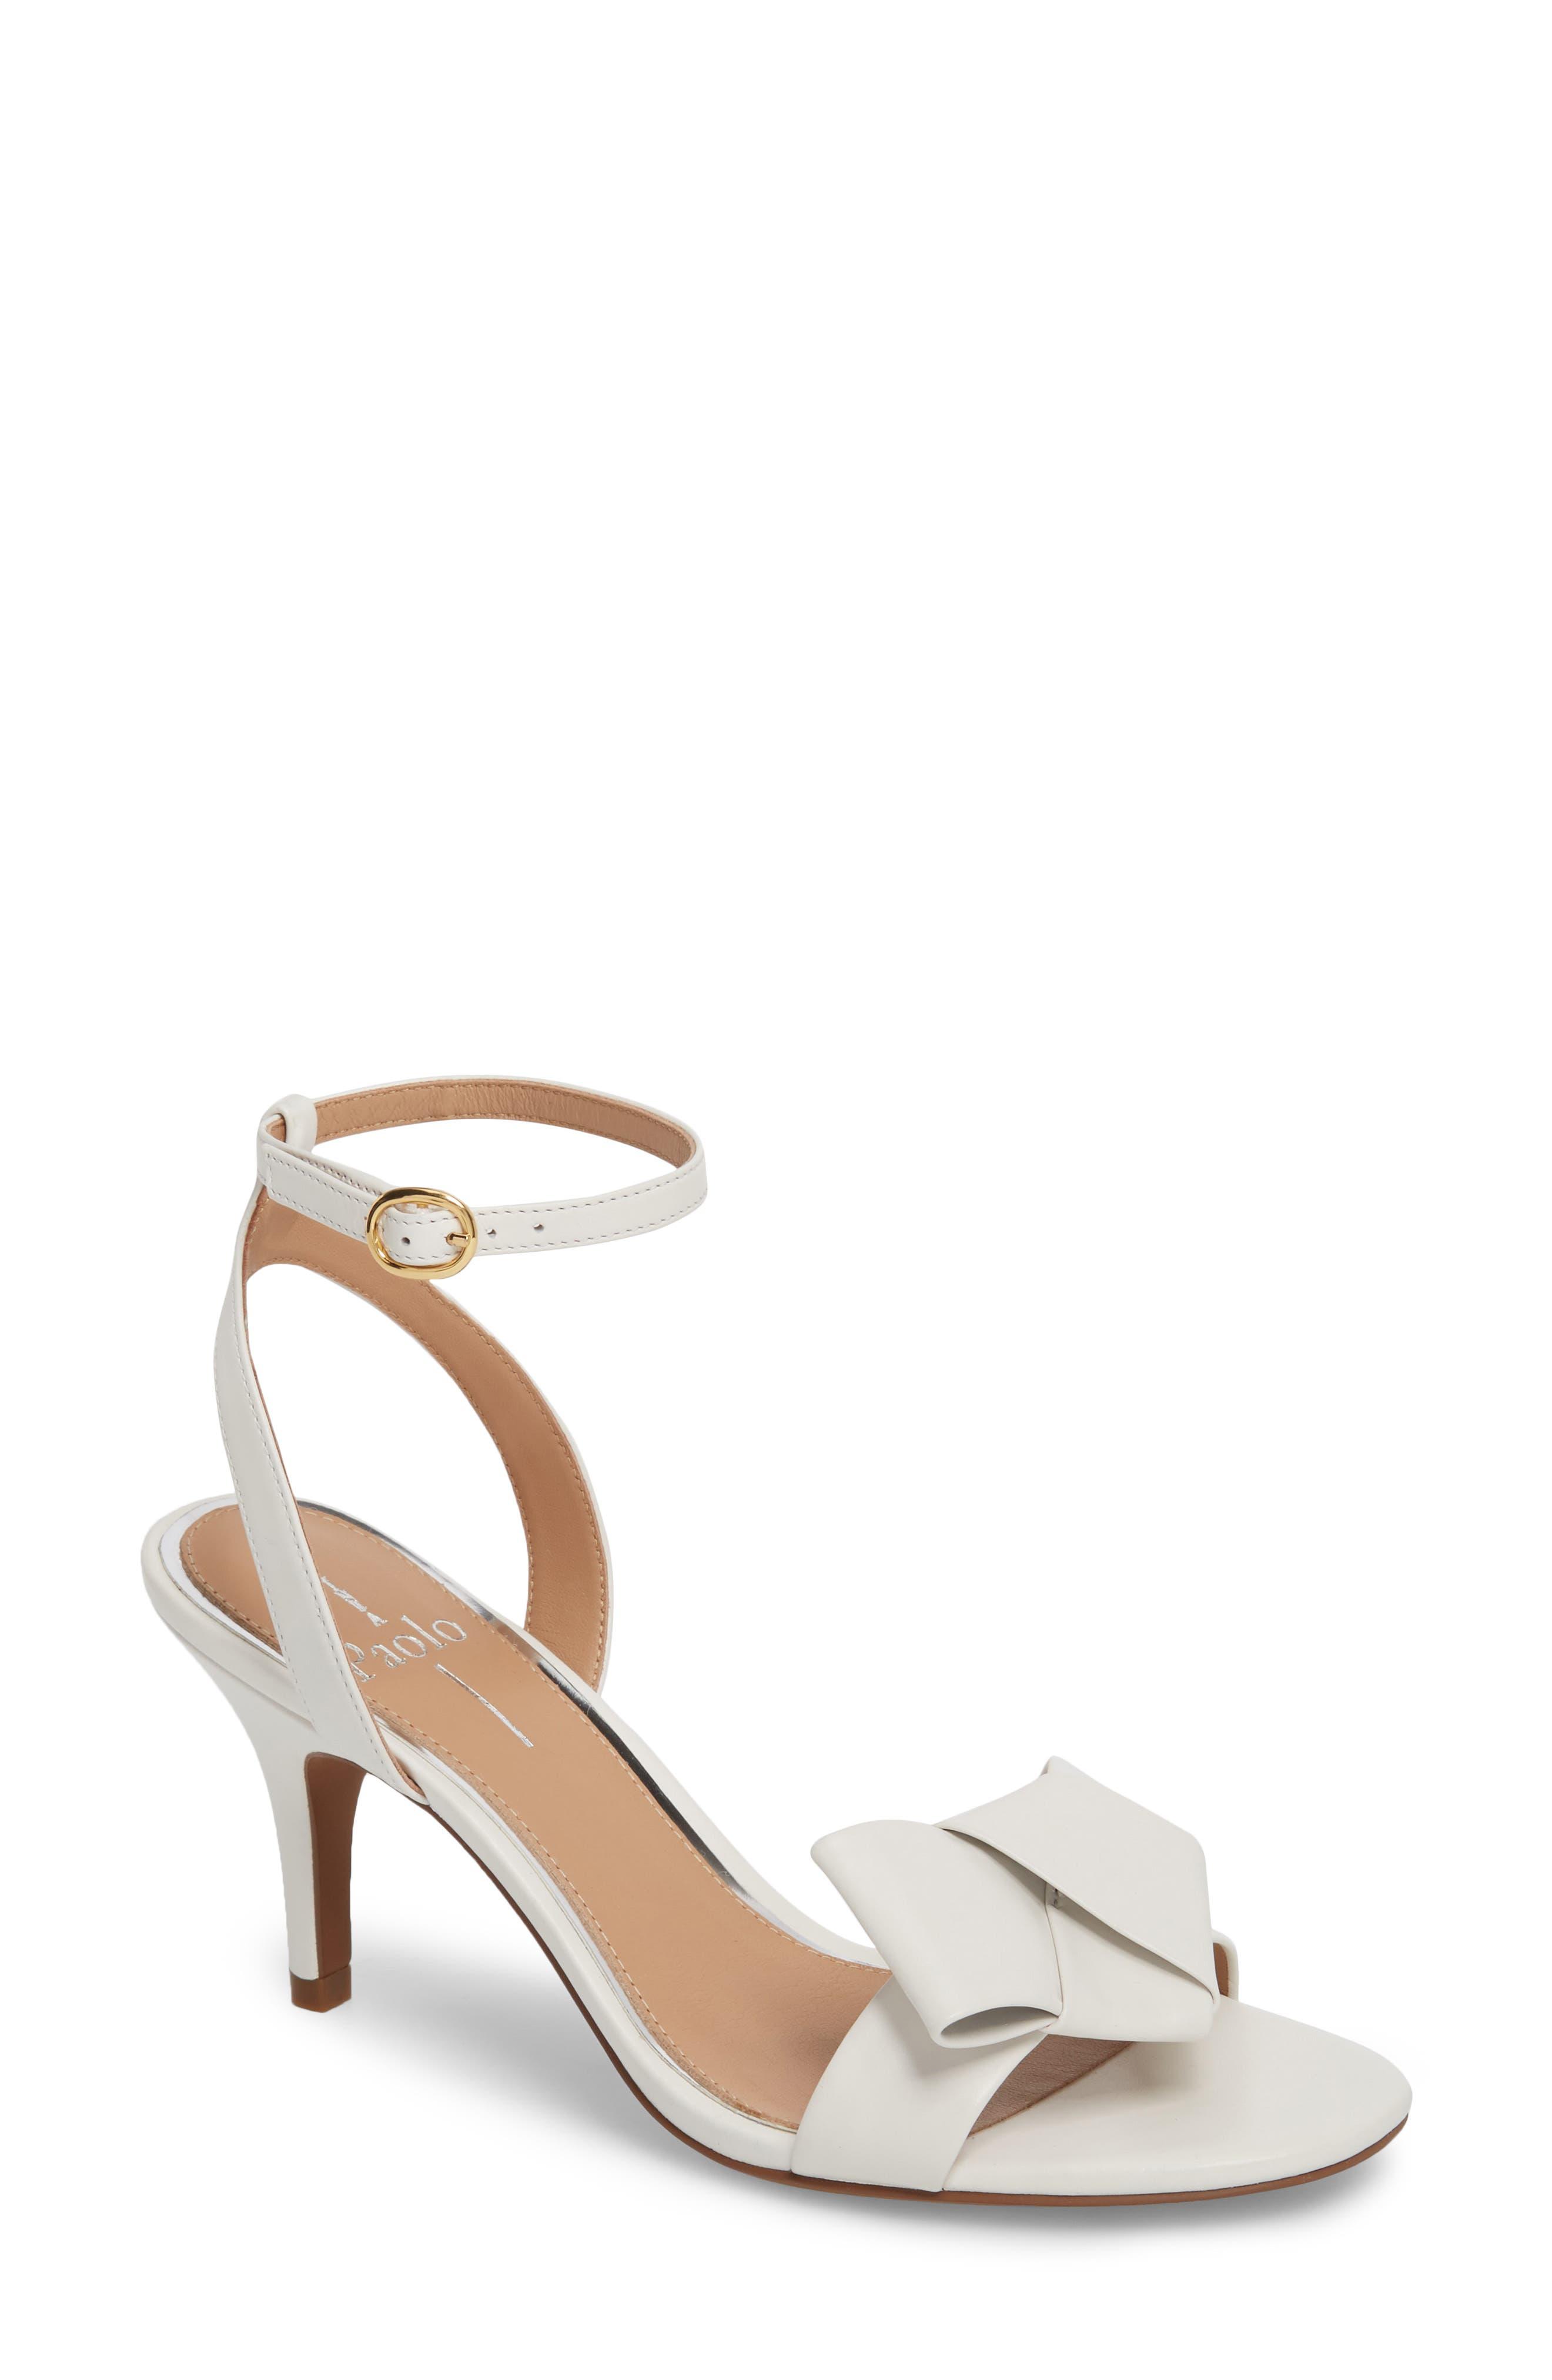 Linea Paolo Haven Ankle Strap Sandal, White